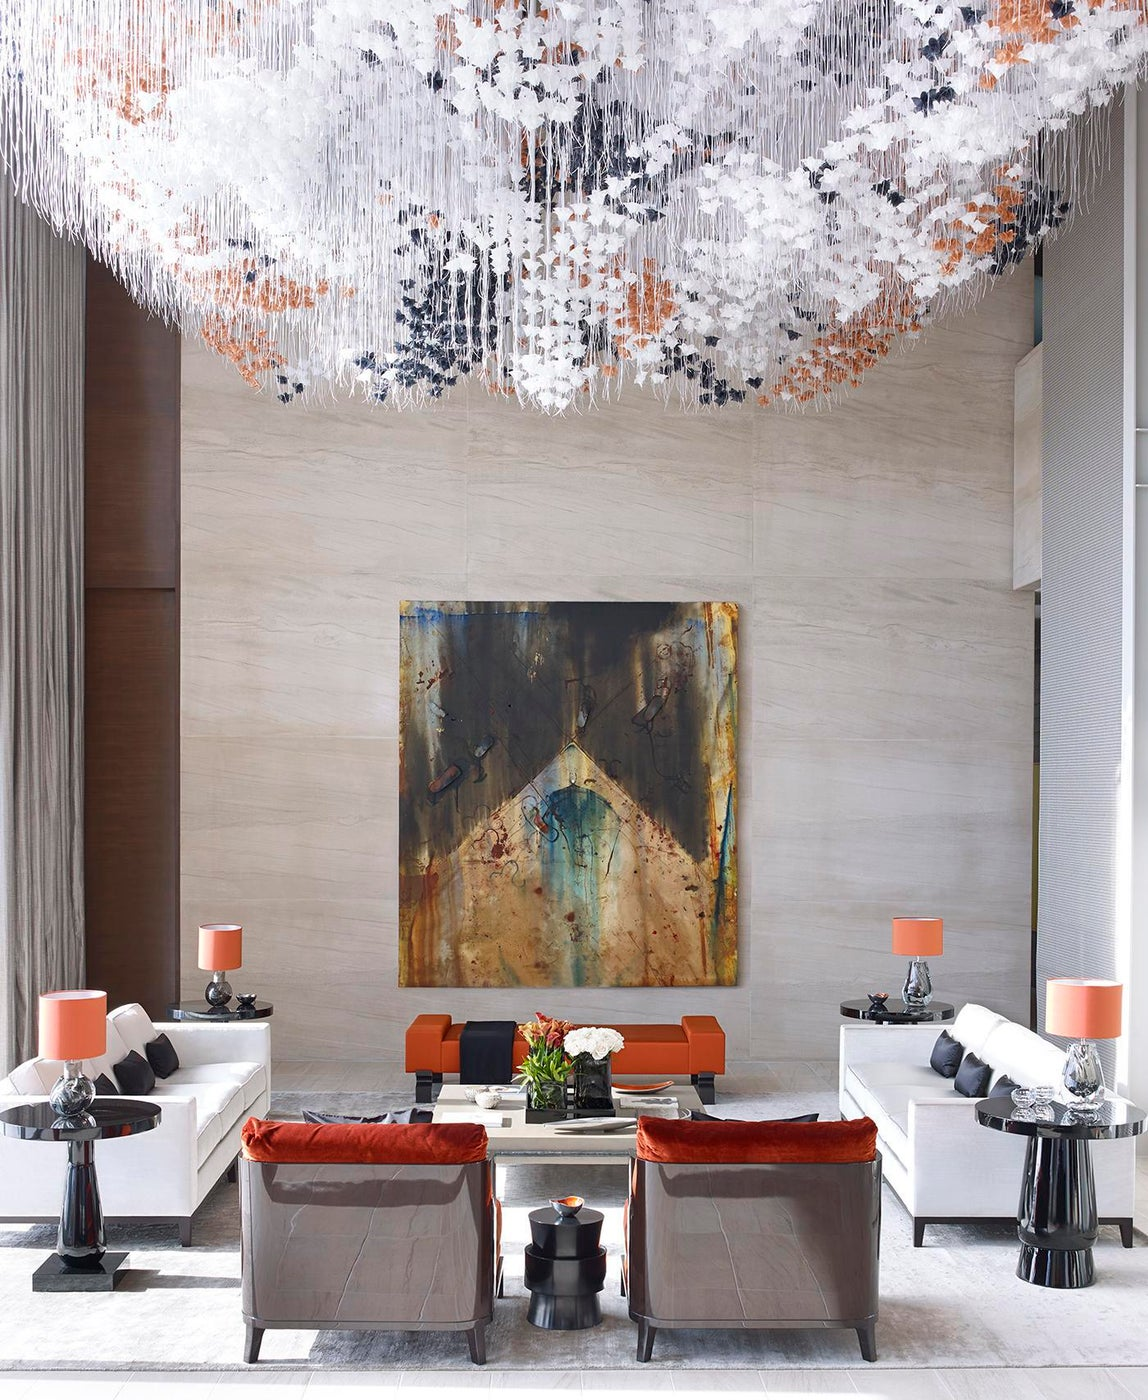 Vero Beach Residence - Living Room South